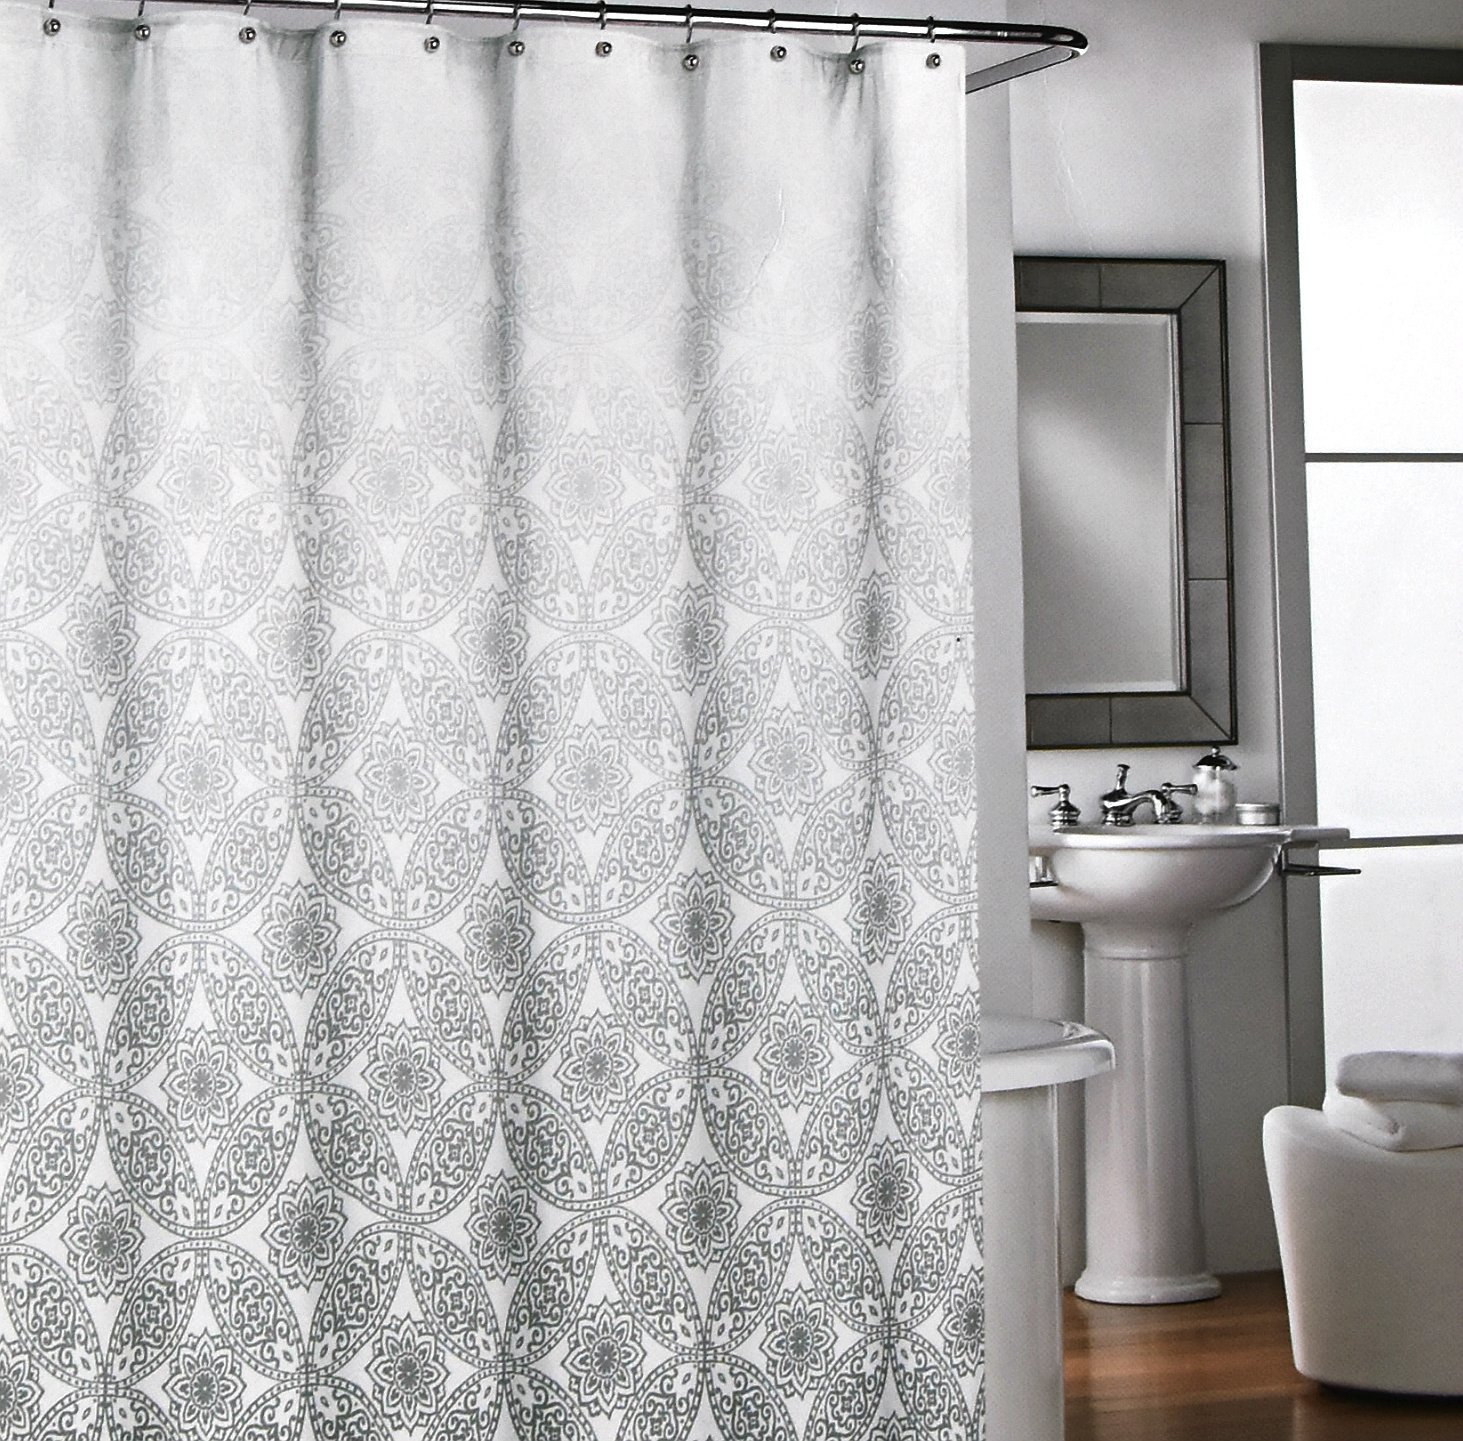 Amazon.com: Cynthia Rowley Luxury Fabric Shower Curtain Grey and ...